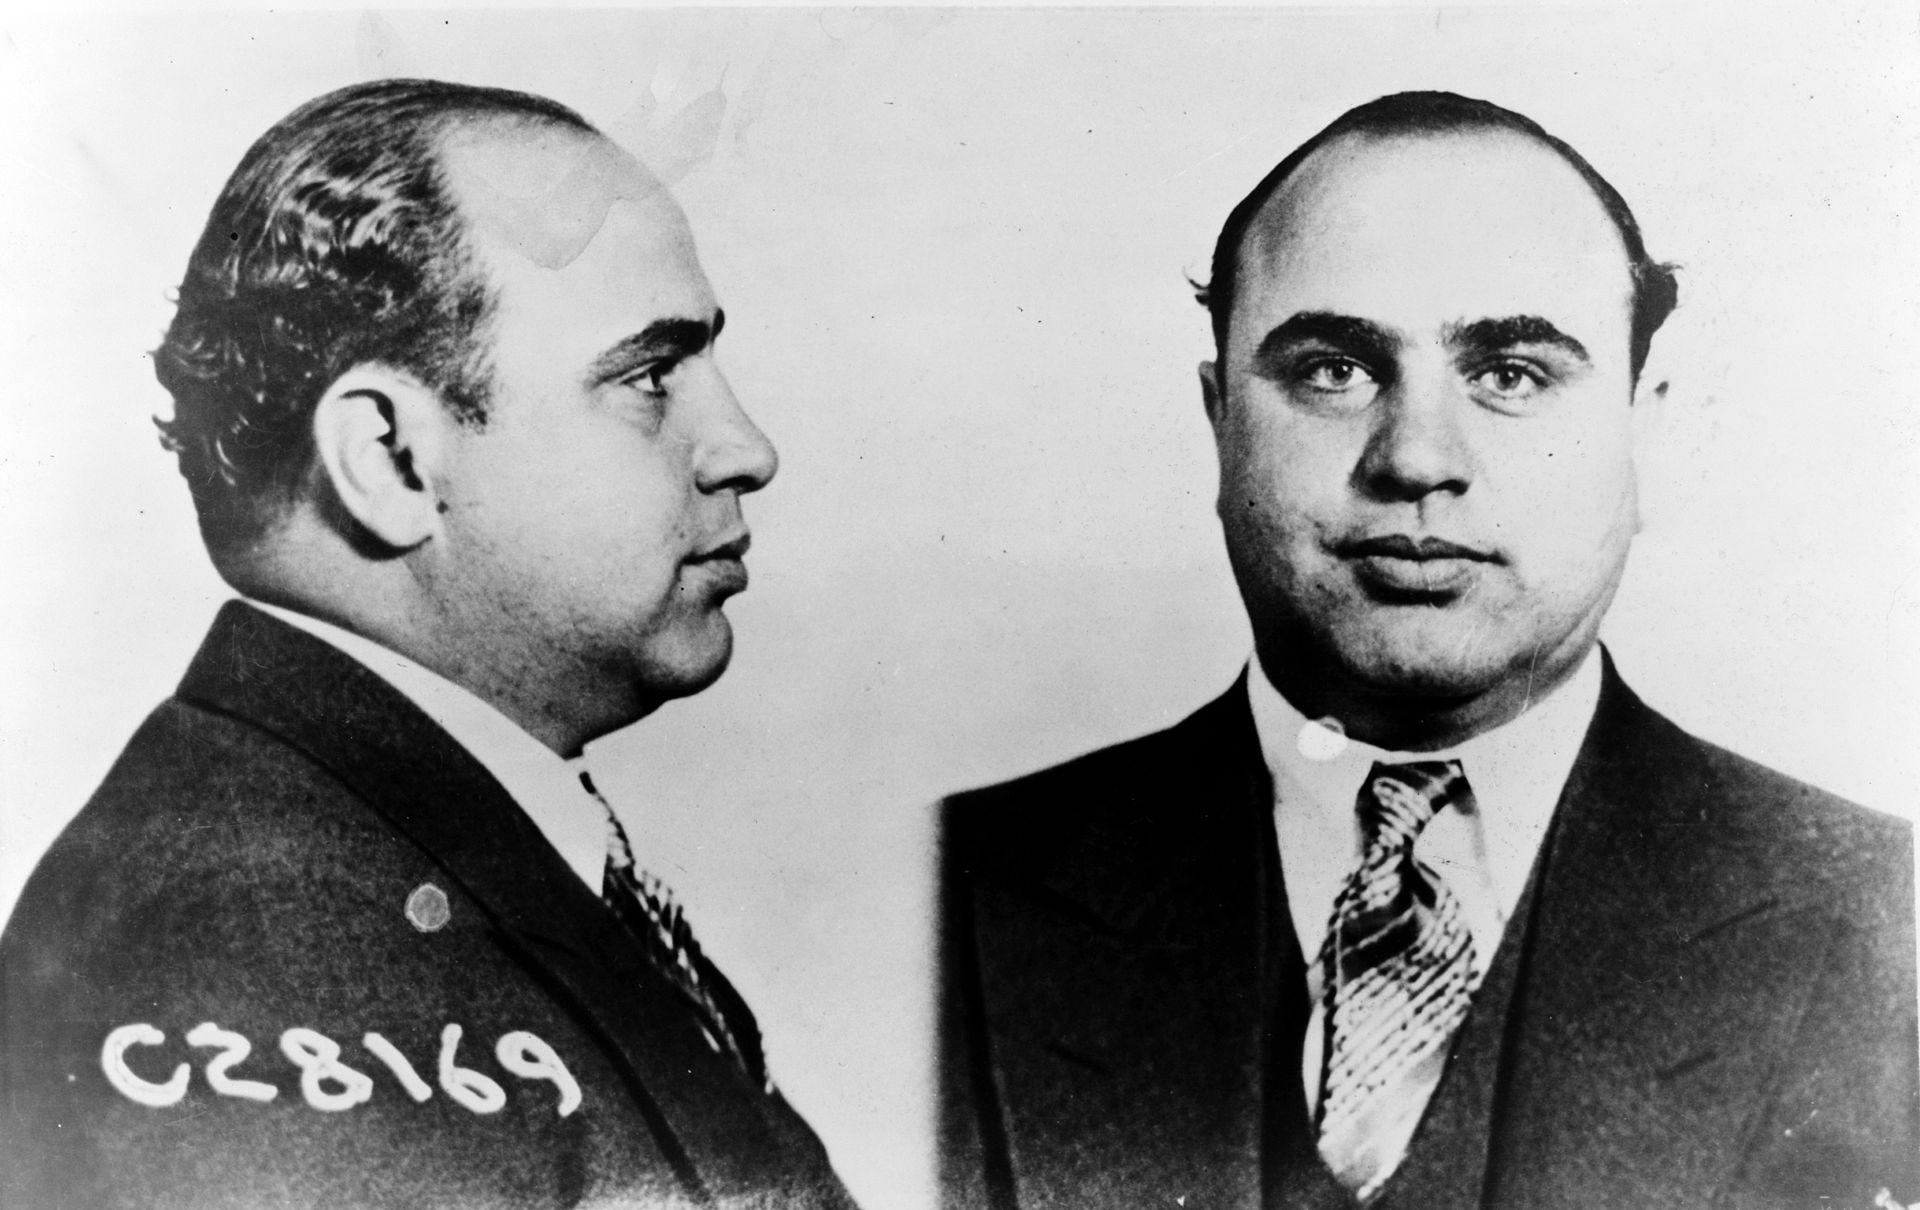 Al Capone kommt ins Gefängnis (c) wikimedia.org